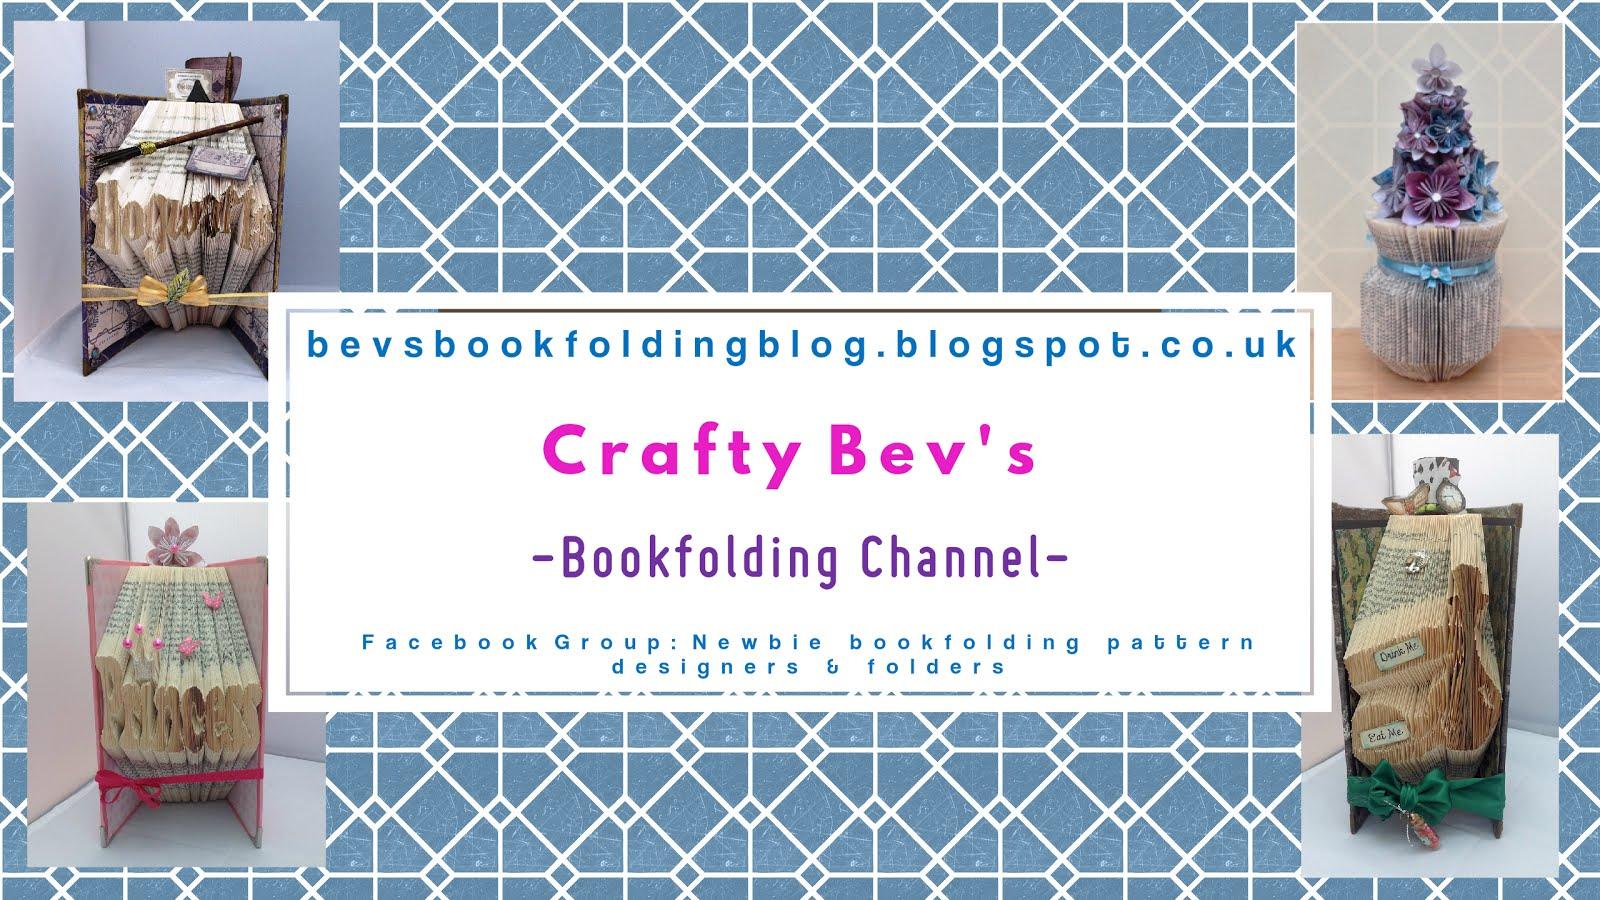 Crafty Bev's Bookfolding Channel